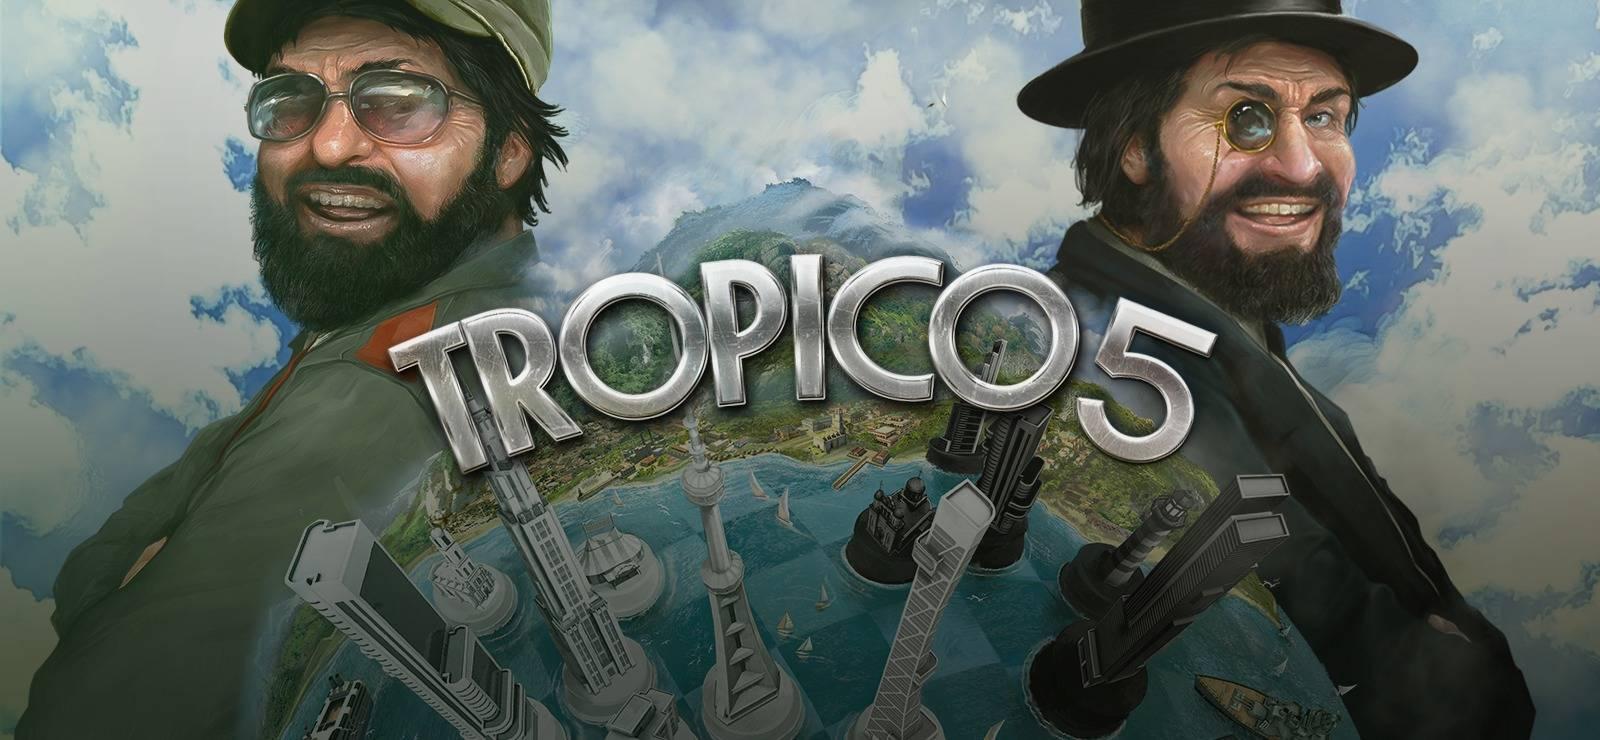 Tropico 5 (2014)